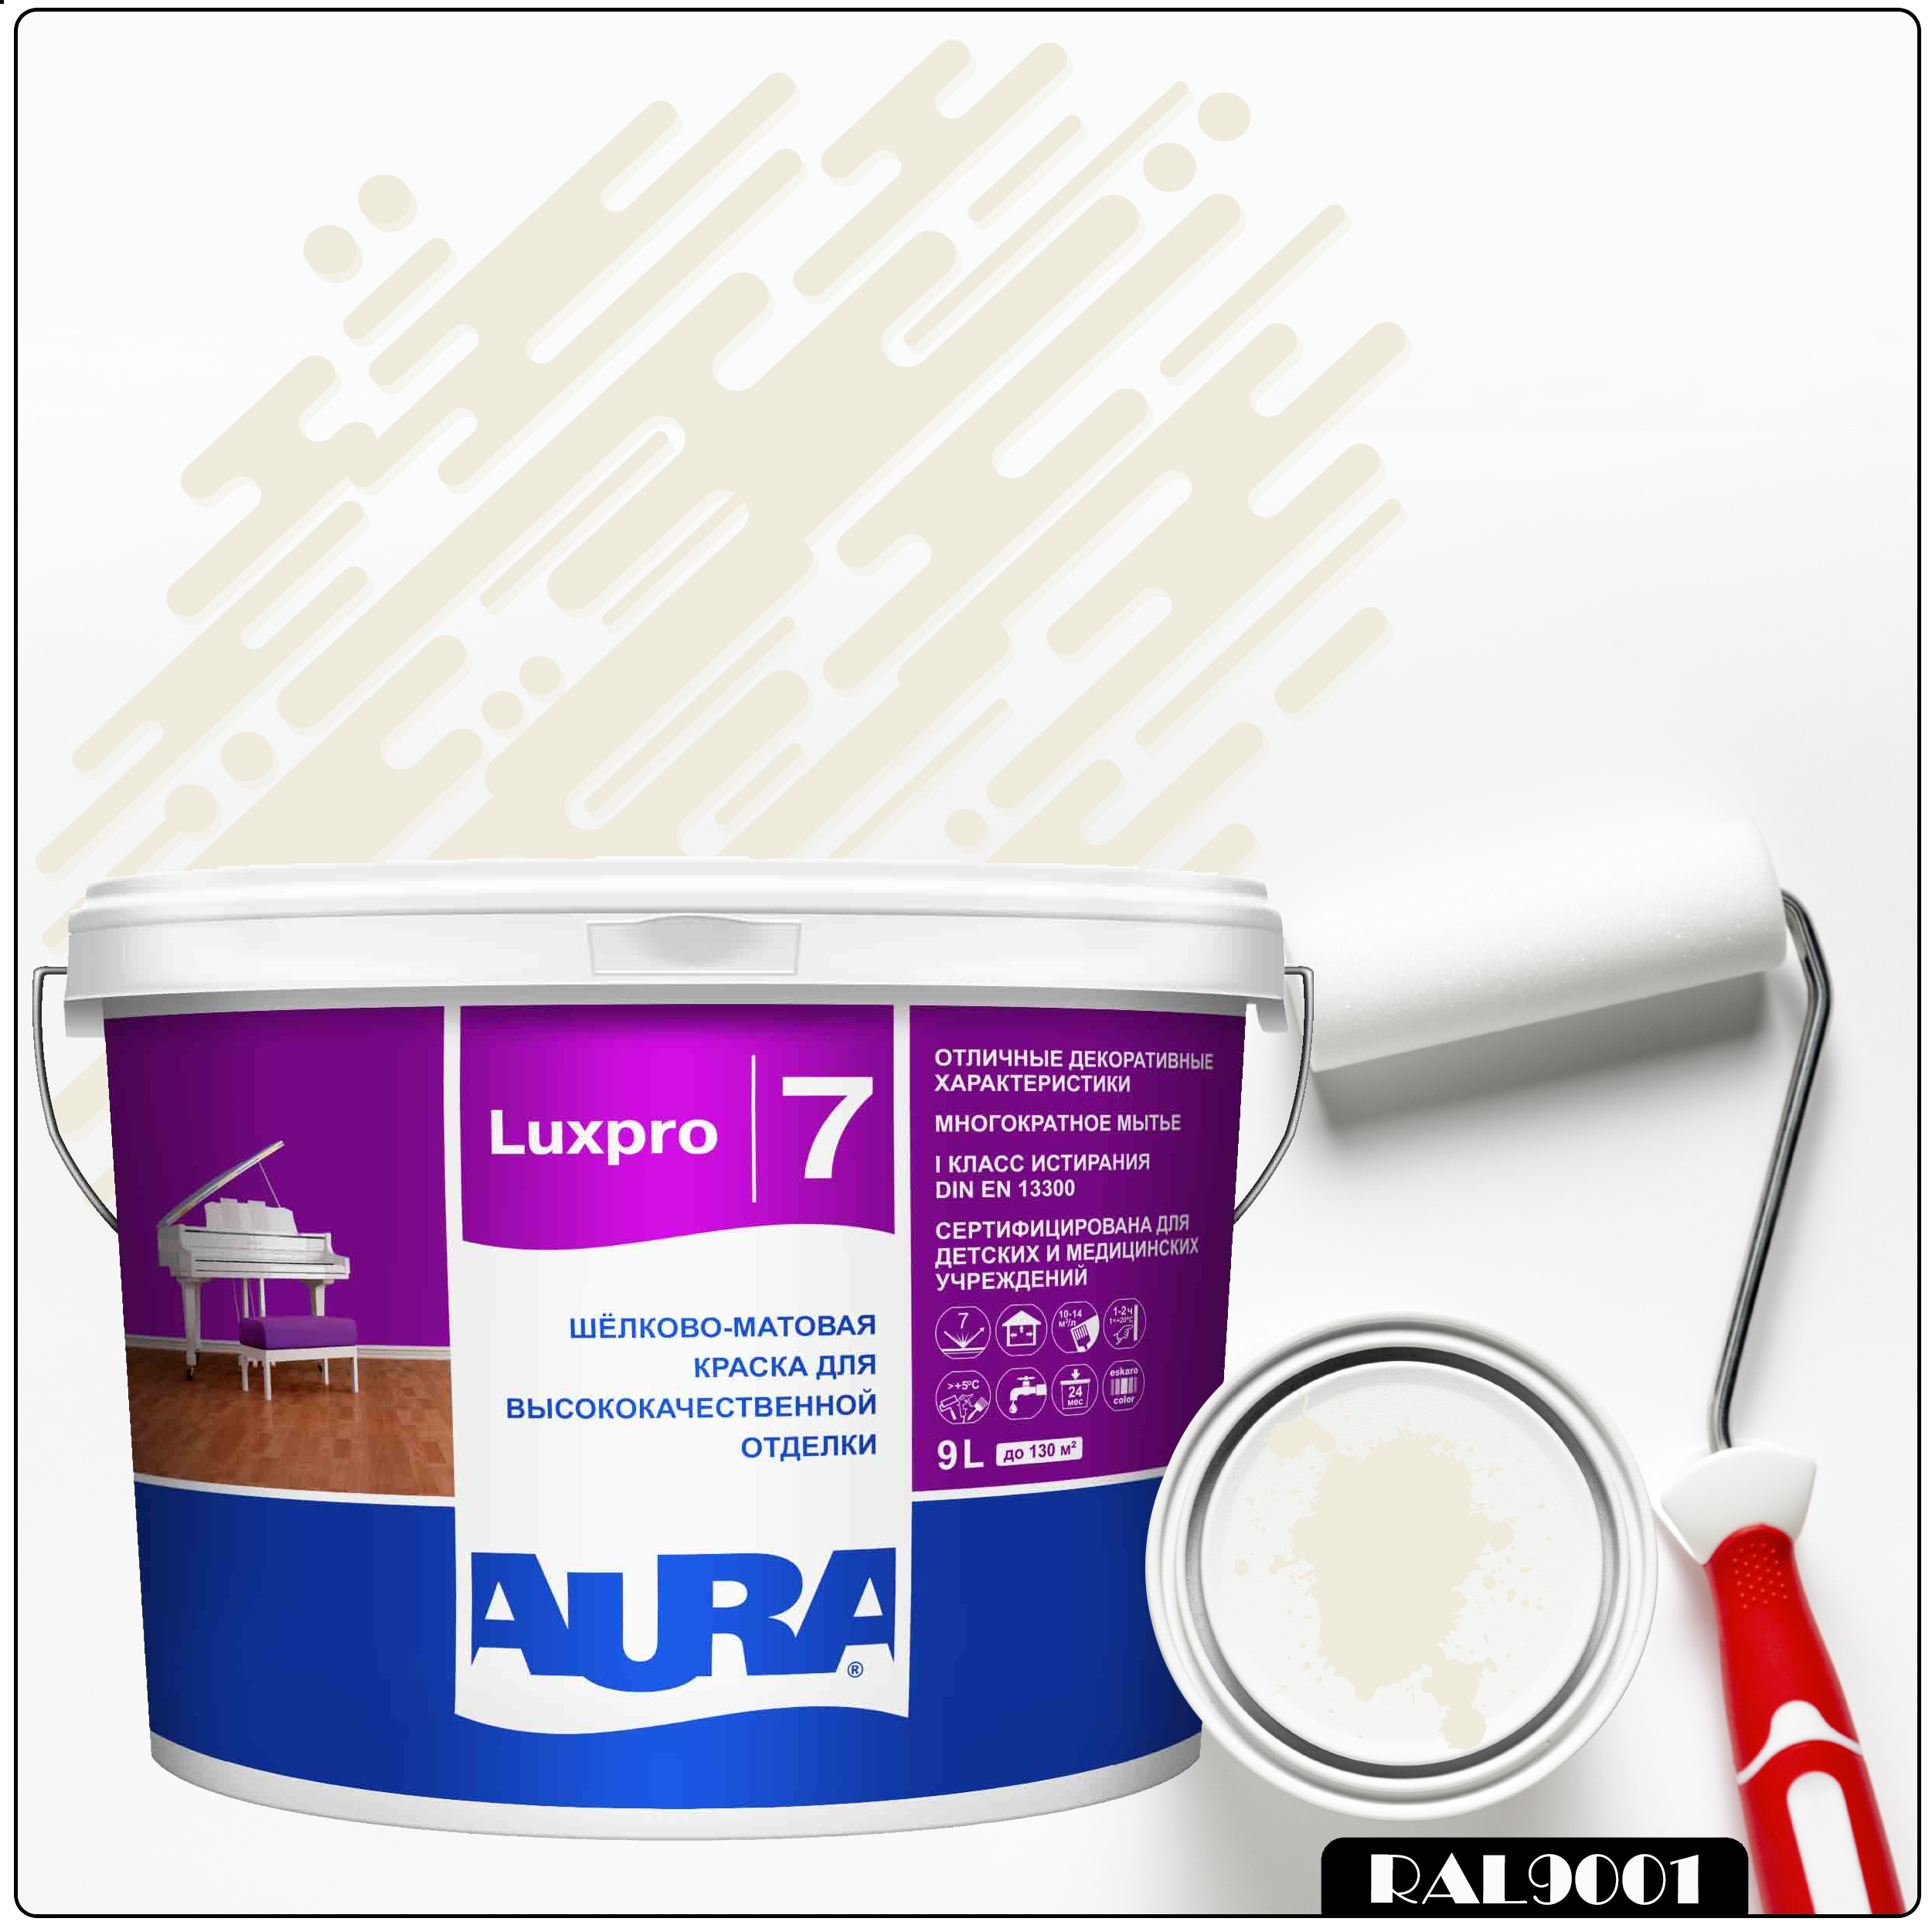 Фото 1 - Краска Aura LuxPRO 7, RAL 9001 Белый крем, латексная, шелково-матовая, интерьерная, 9л, Аура.